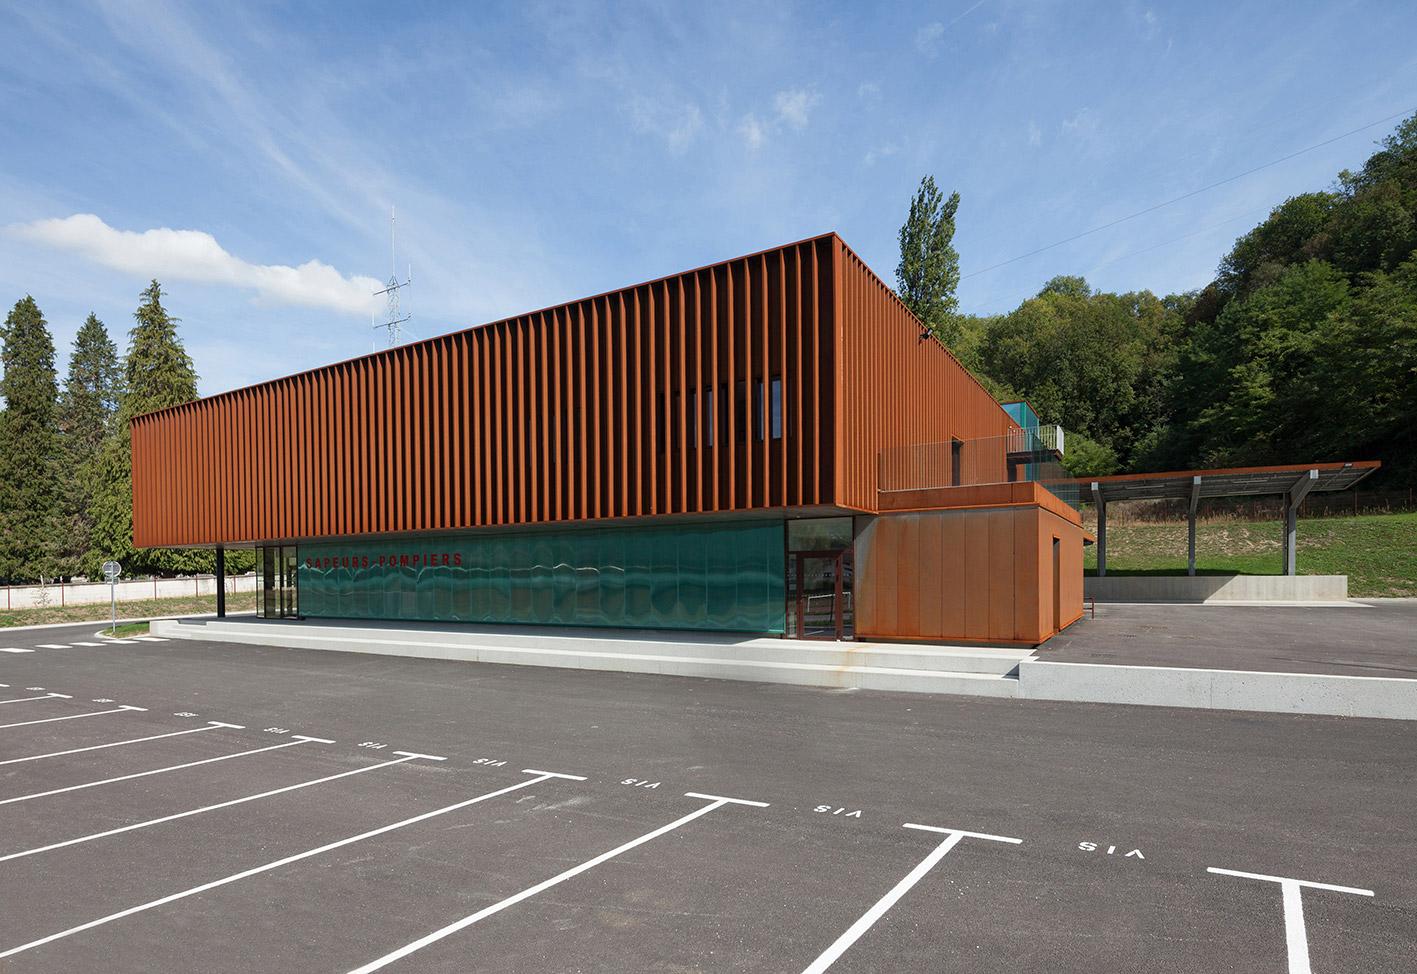 jerome-ricolleau-photographe-architecture-lyon-Composite-grenoble-sdis-caserne-pompiers-seyssel-4